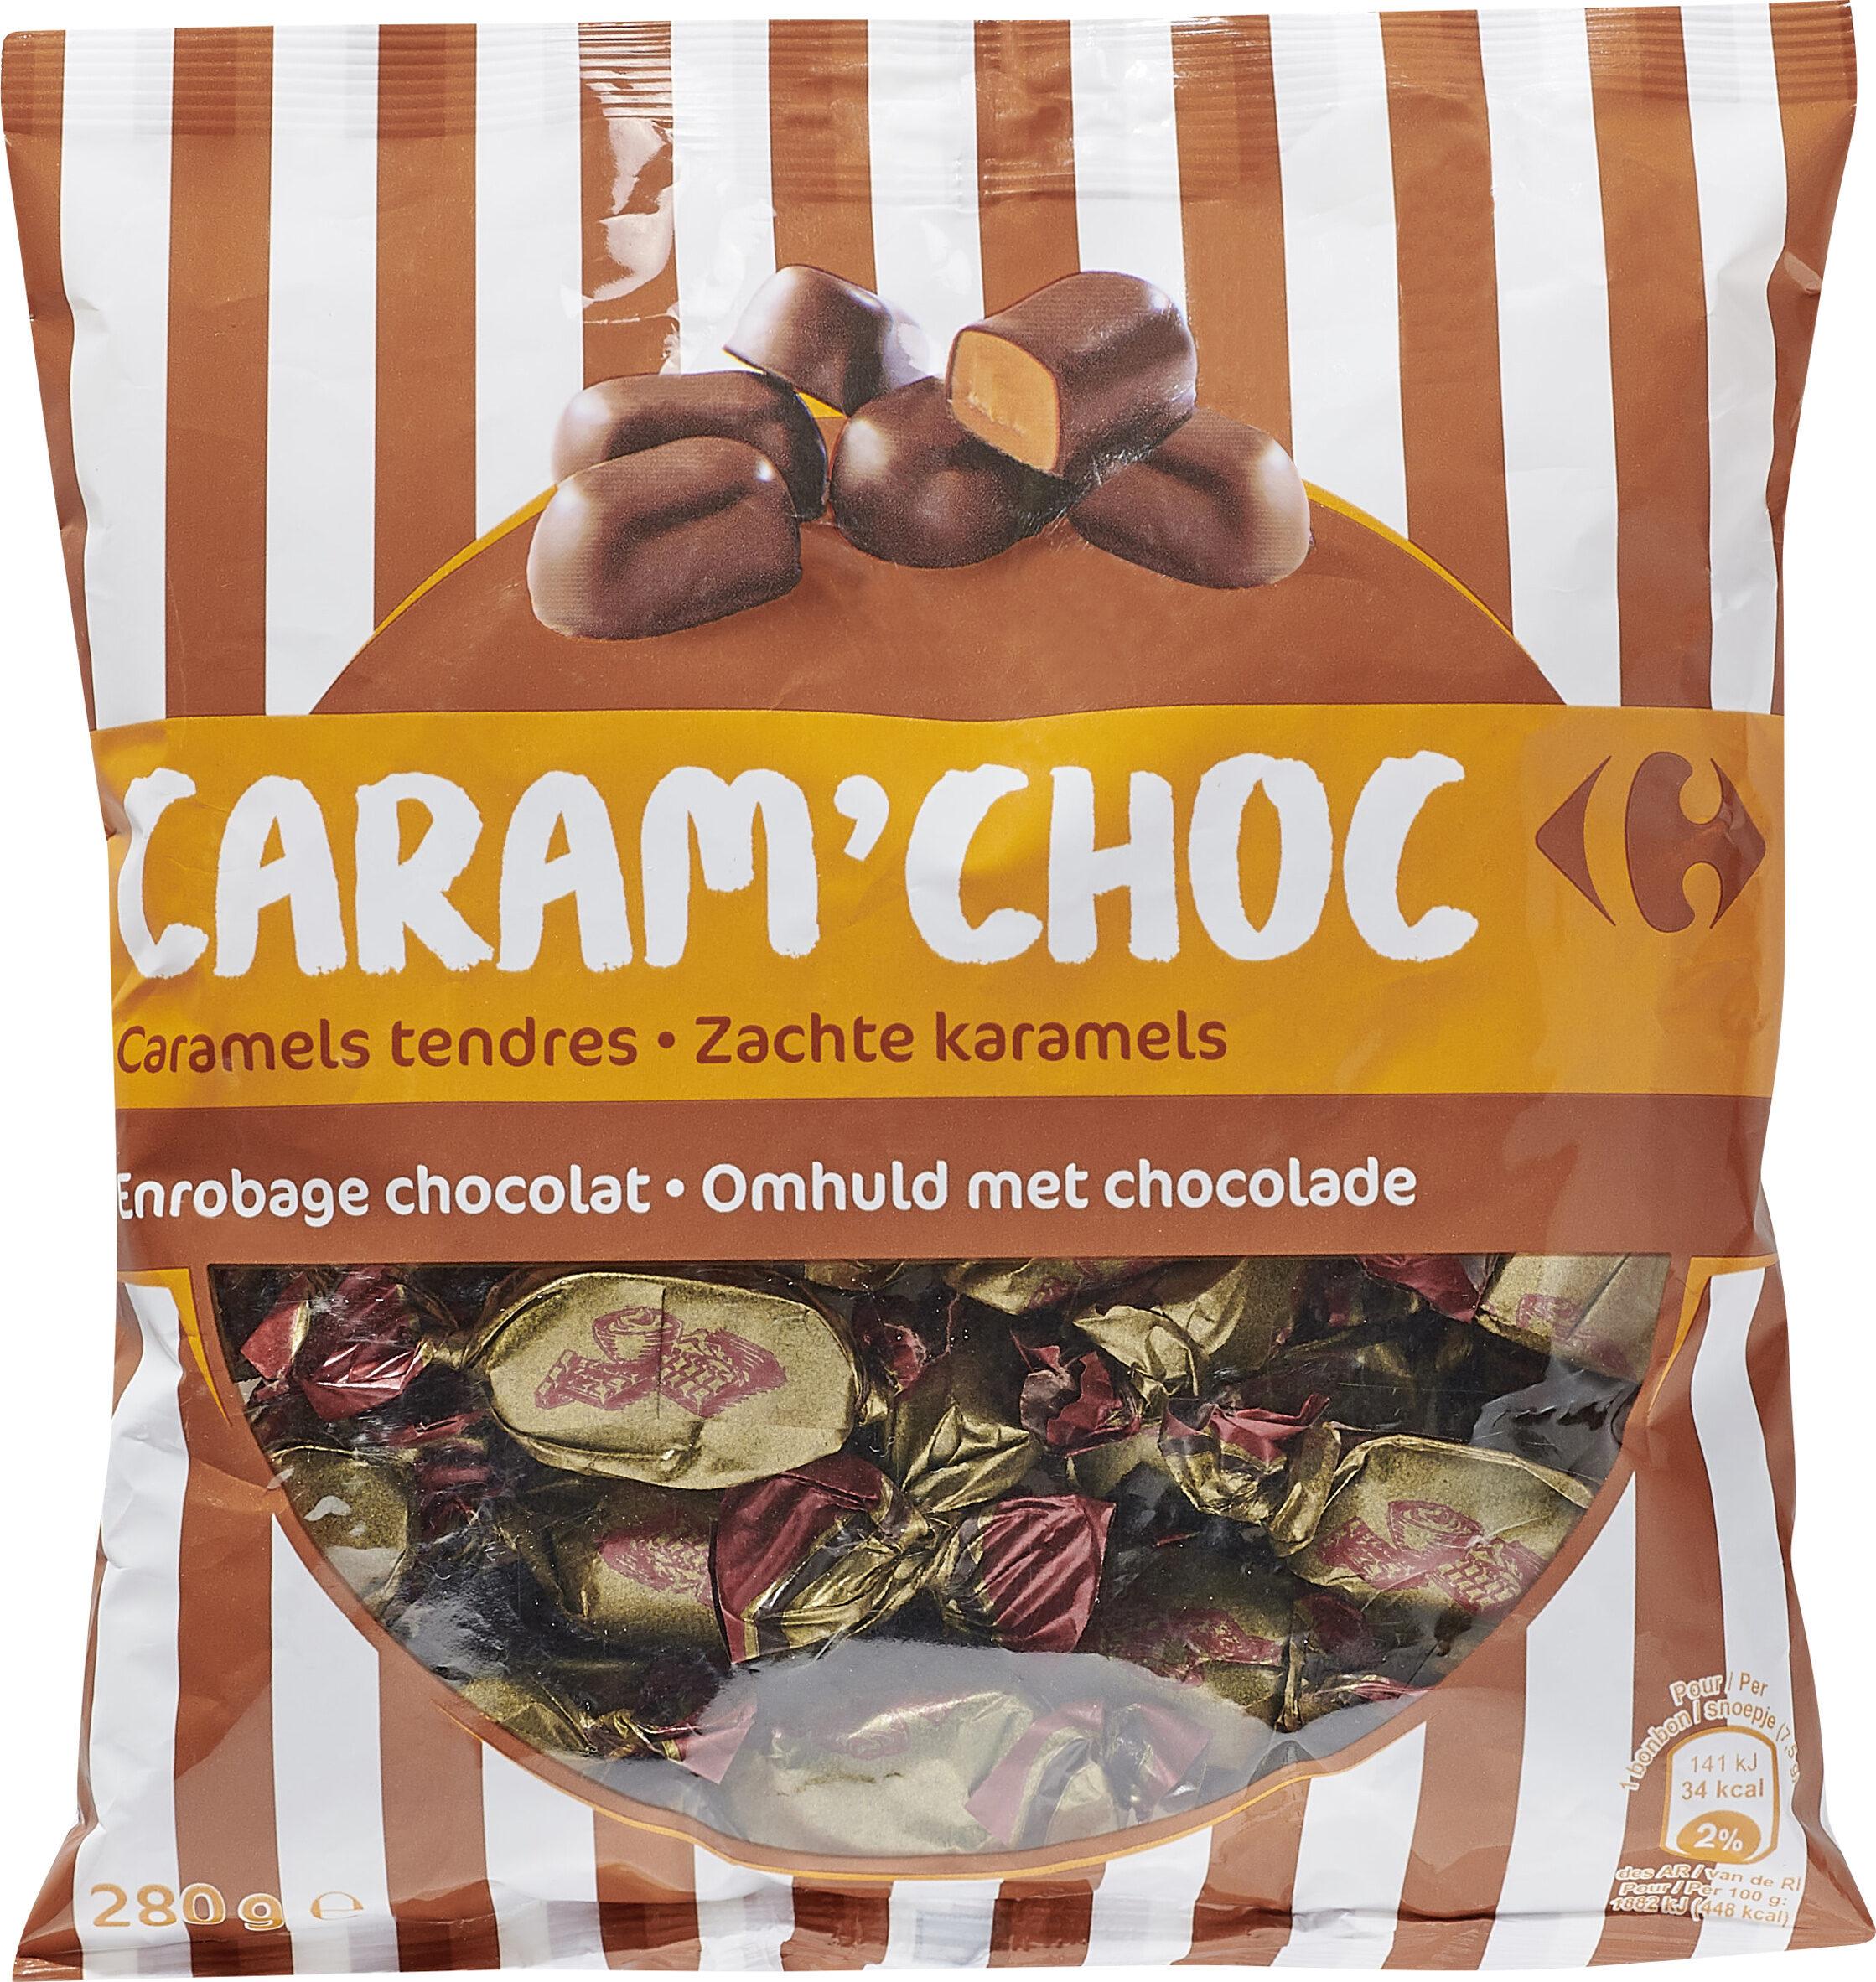 CARAM'CHOC Caramels tendres - Product - fr